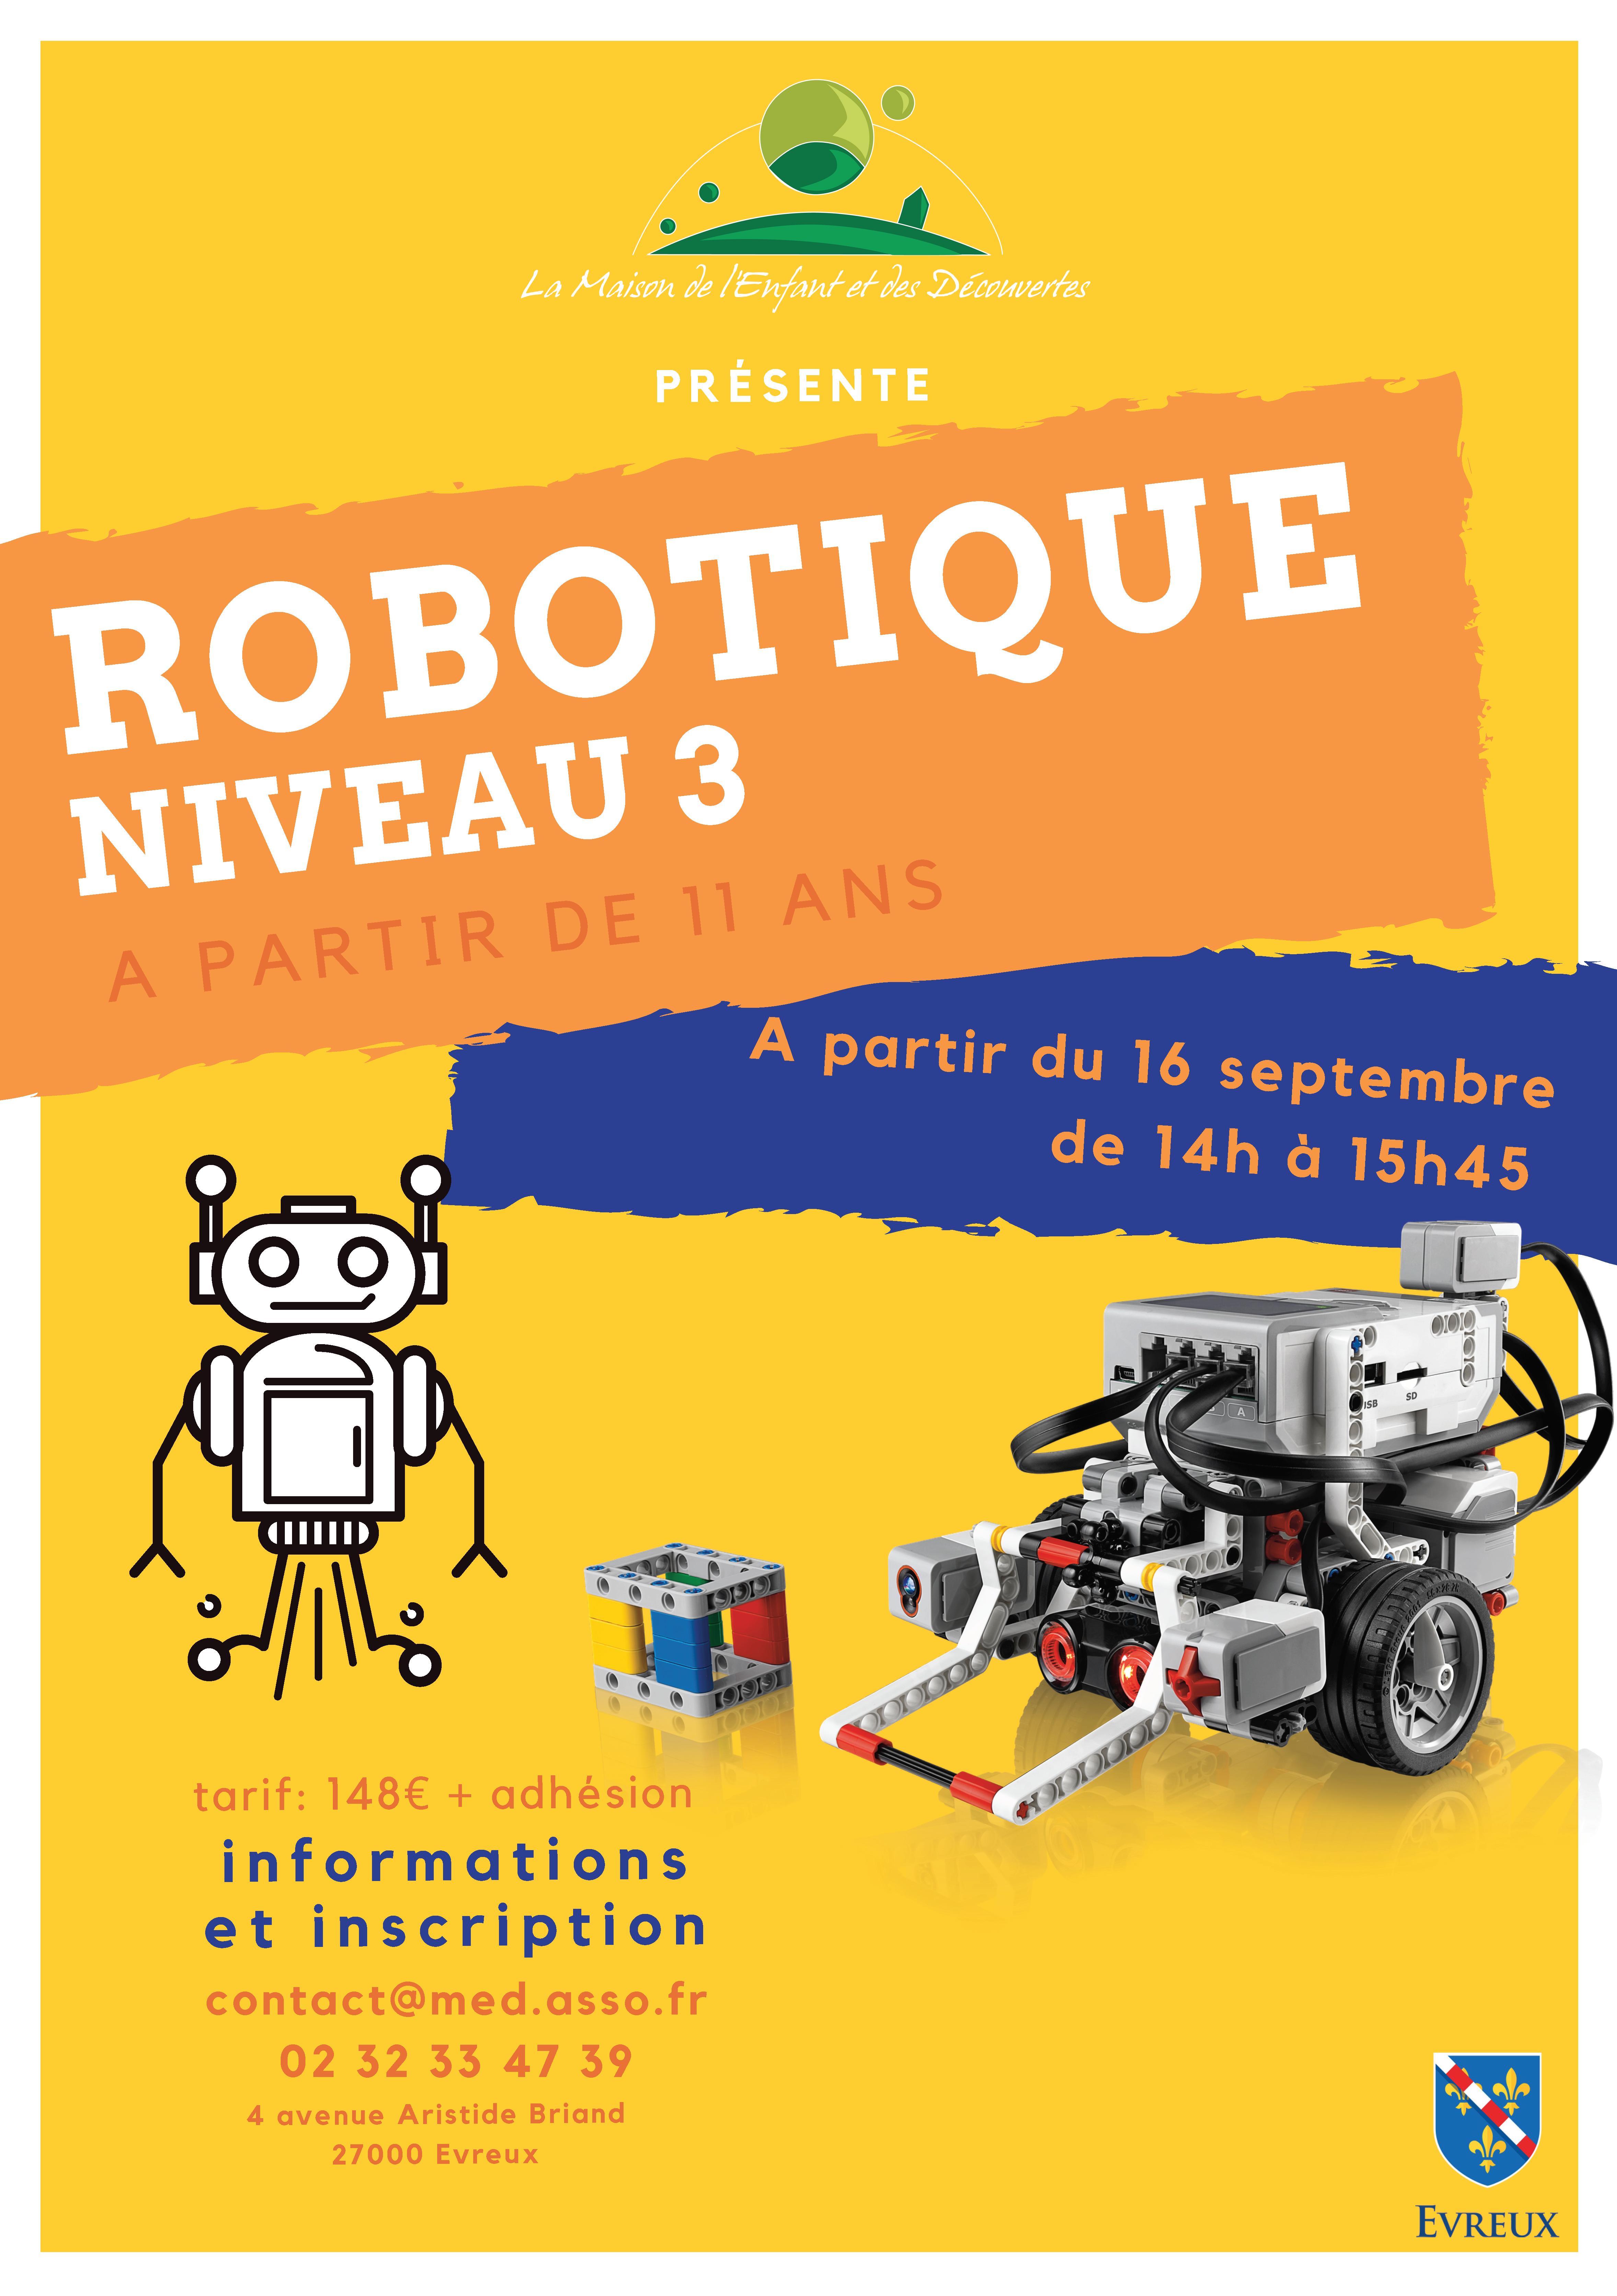 Robotique nv3